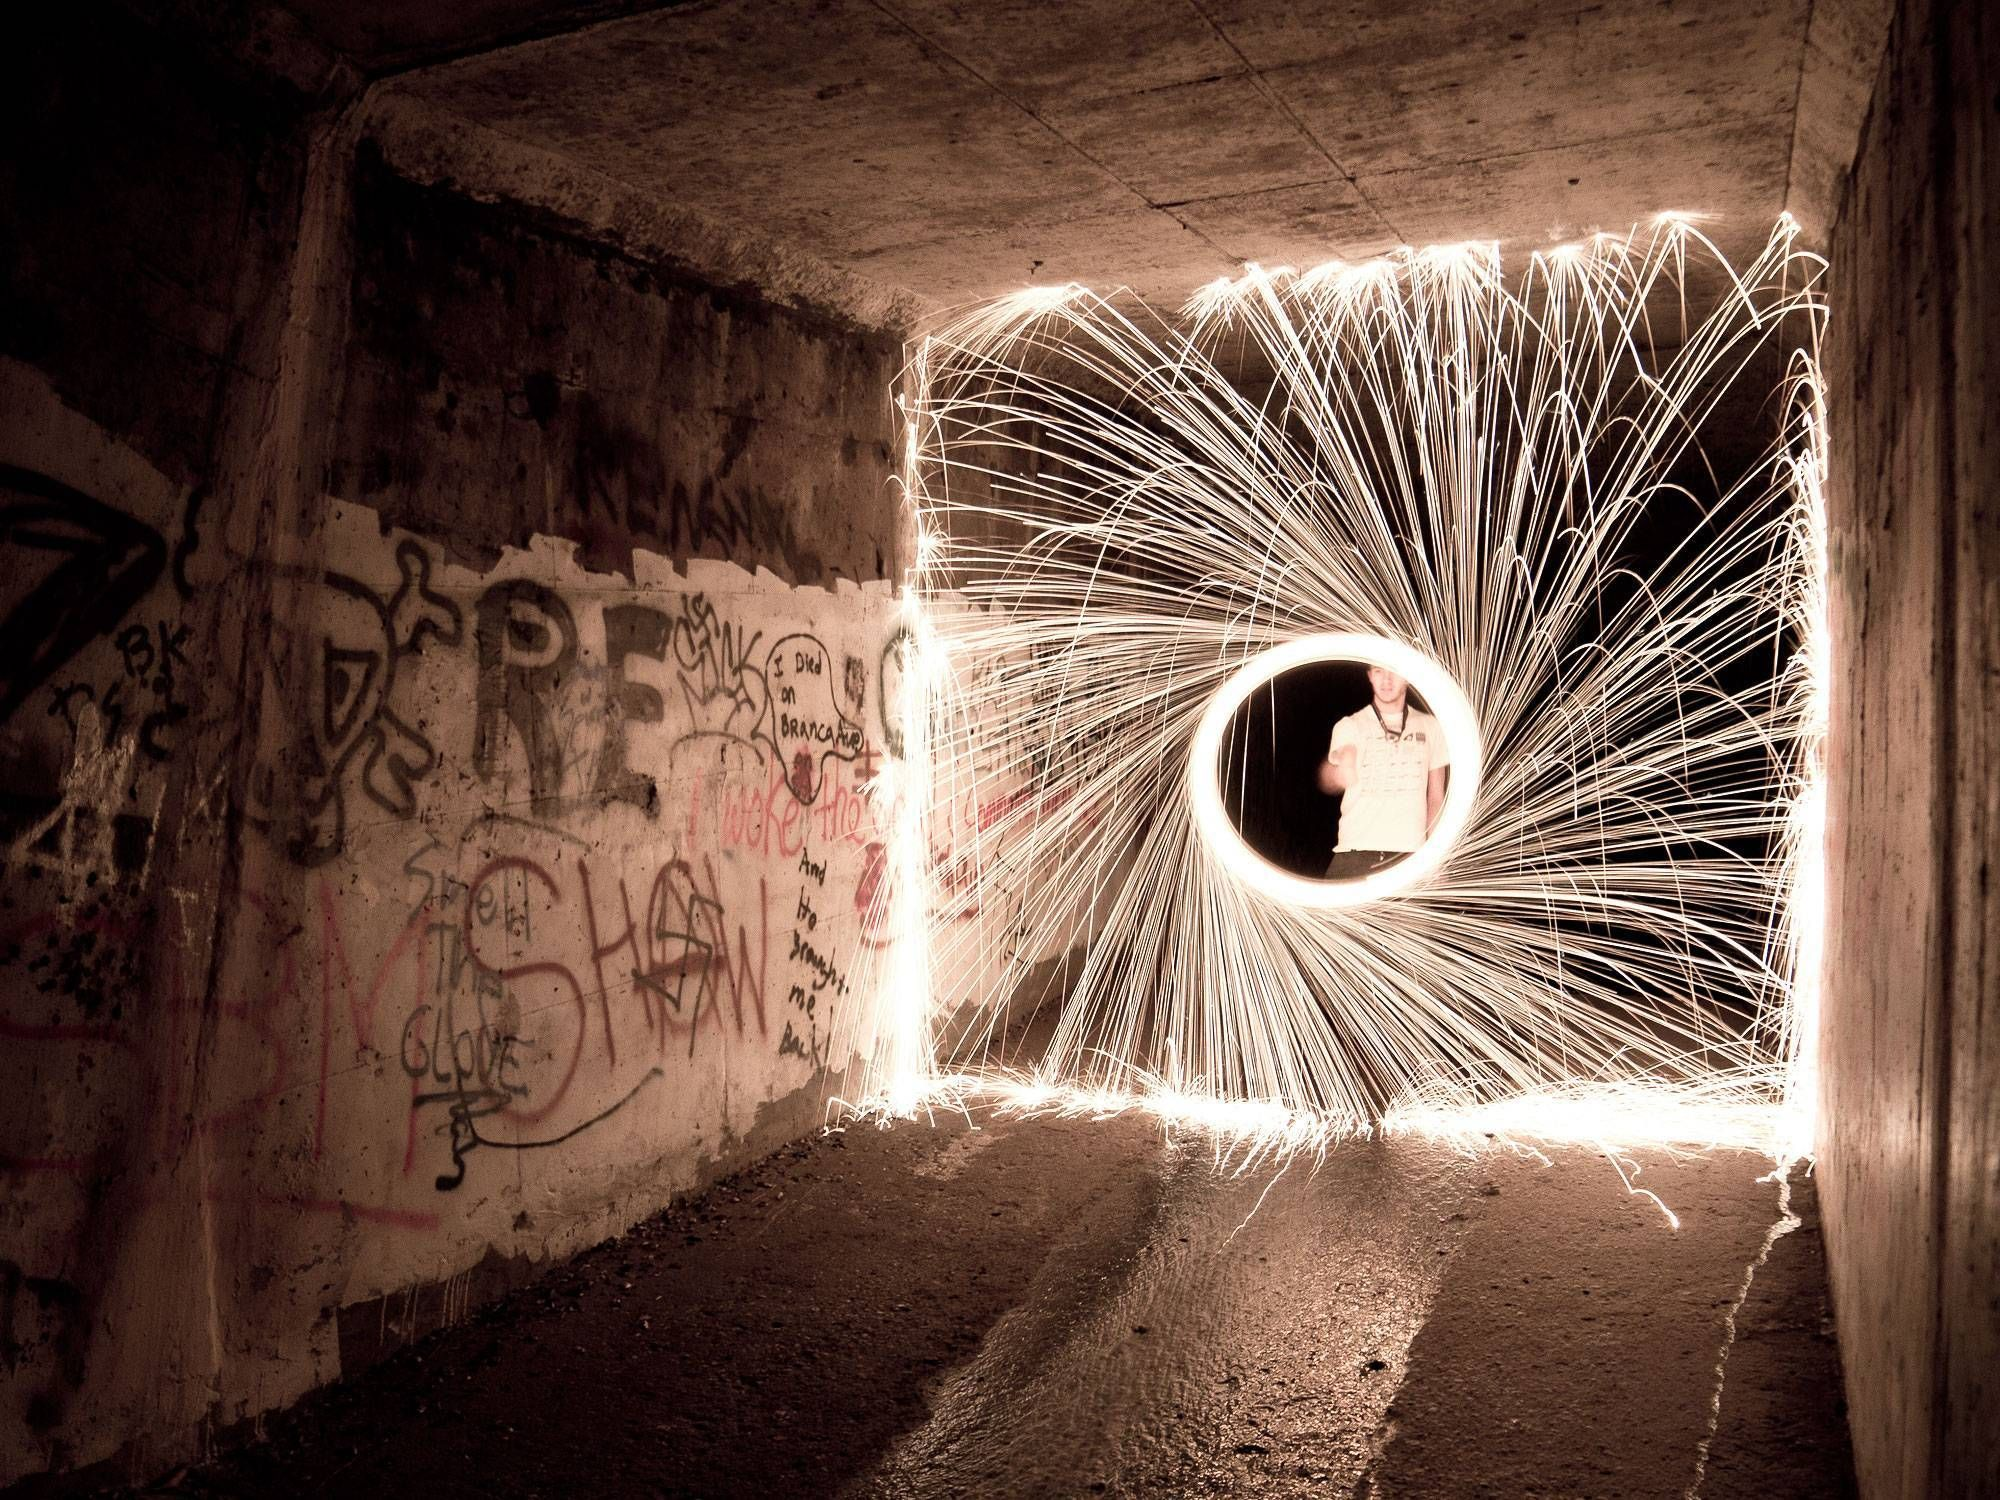 Best Long Exposure Ideas On Pinterest Photography Long - Fruit provides light for long exposure photographs